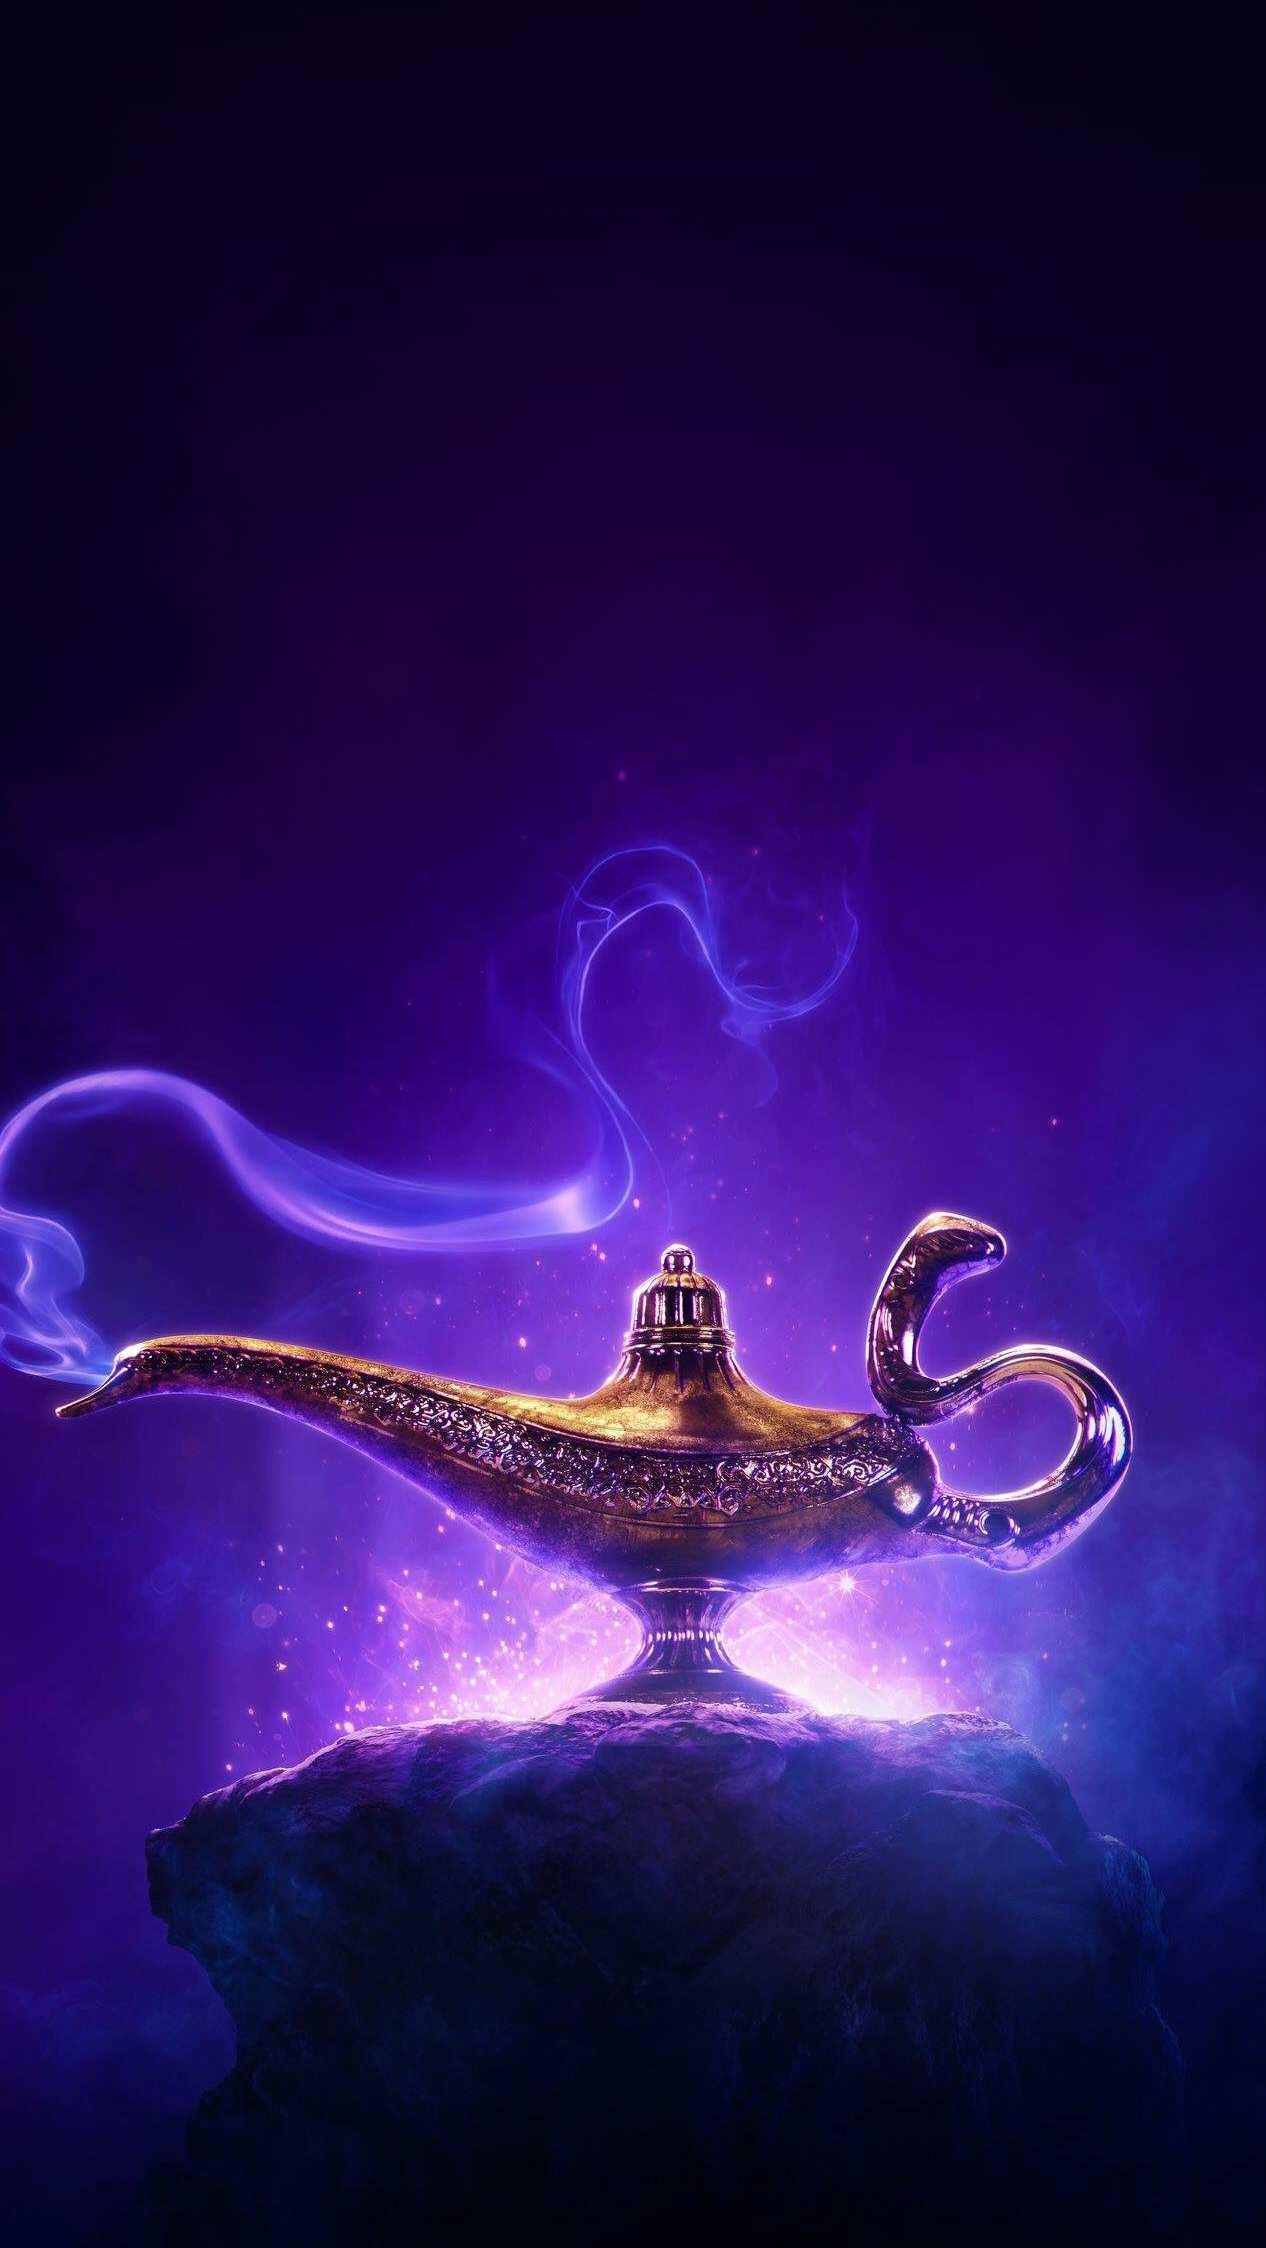 Aladdin iPhone Wallpaper